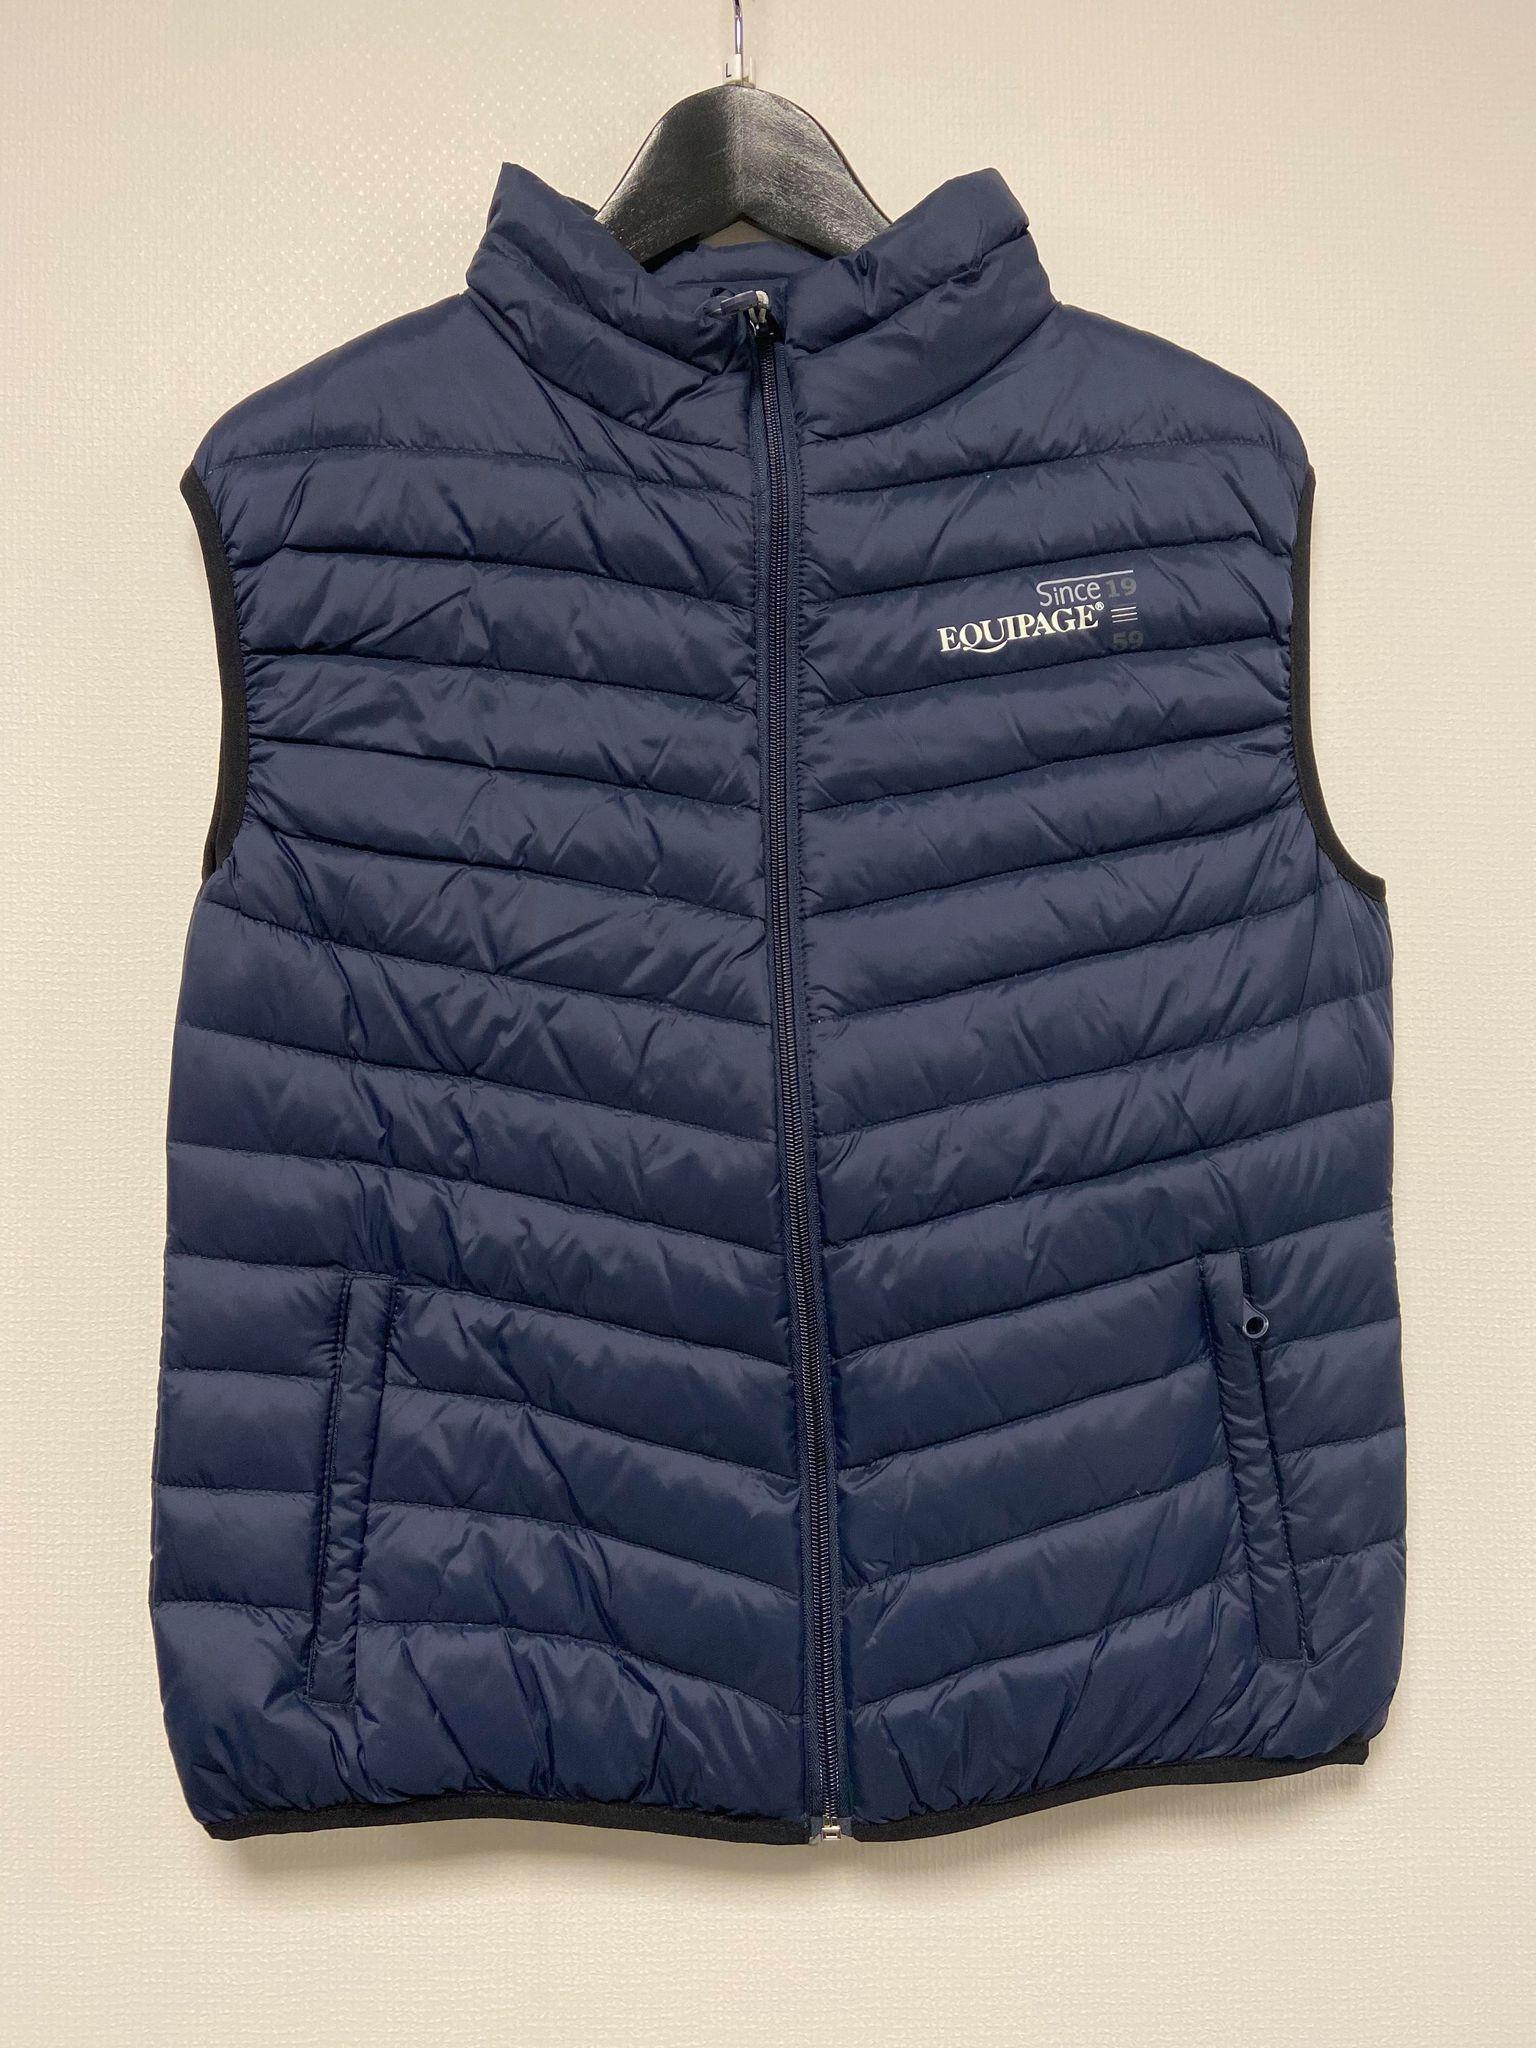 Equipage Vest